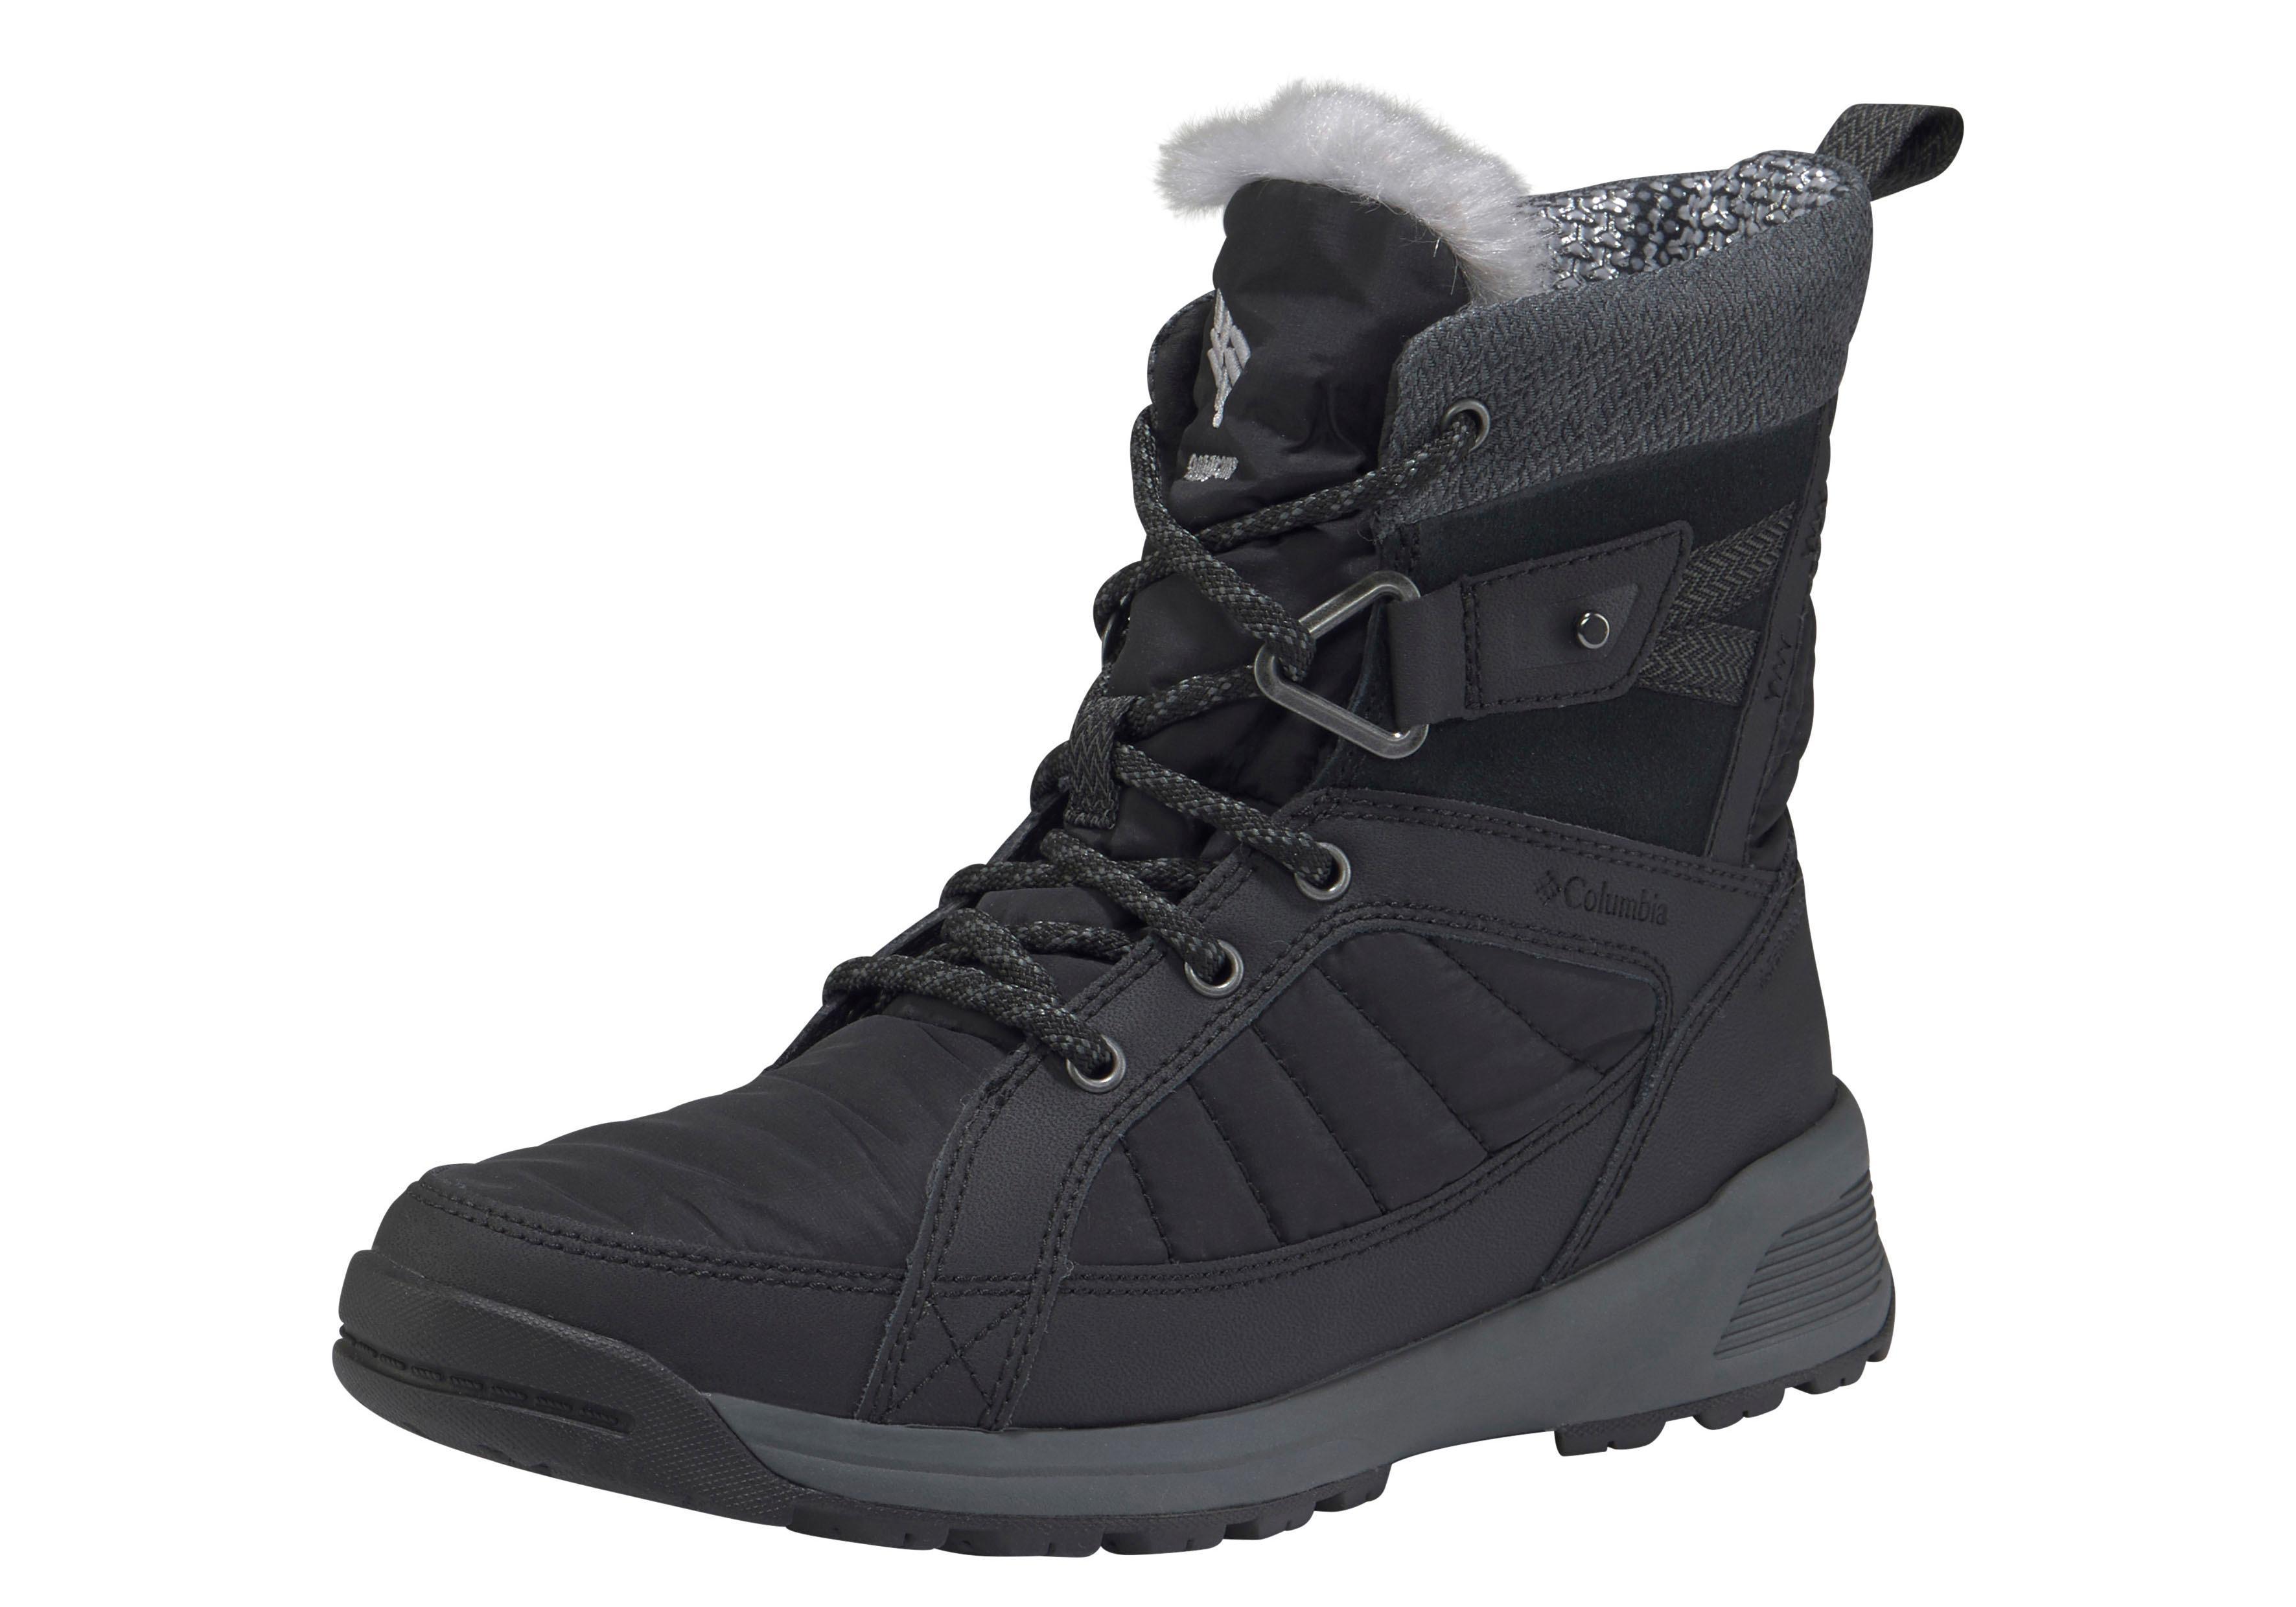 Columbia Outdoorwinterstiefel »MEADOWS? SHORTY OMNI-HEAT? 3D« | Schuhe > Outdoorschuhe > Outdoorwinterstiefel | Schwarz | COLUMBIA